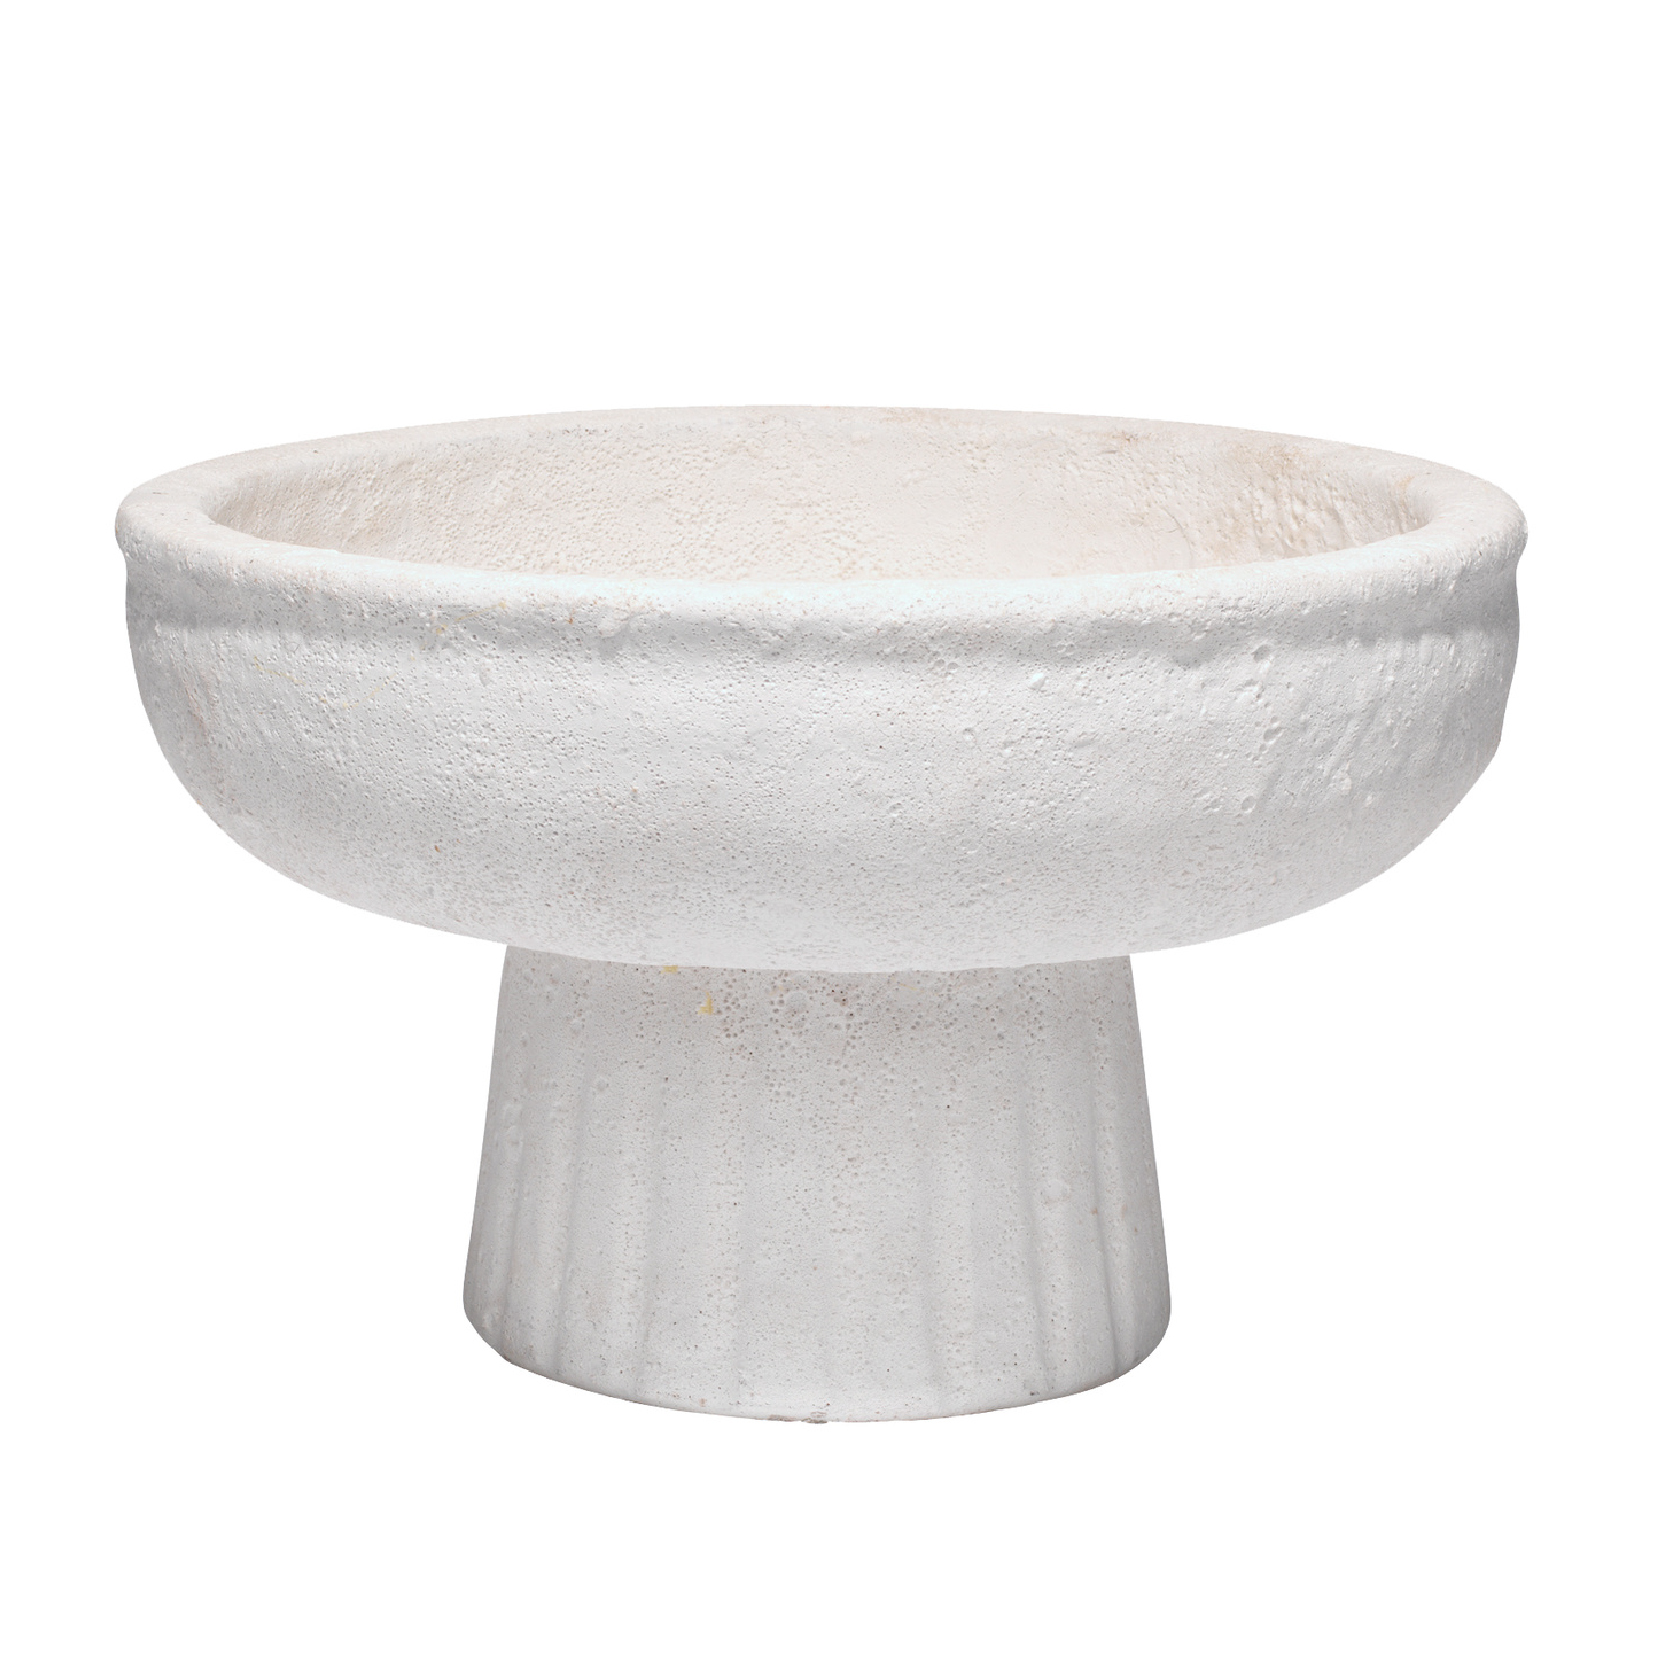 Aegean Bowl